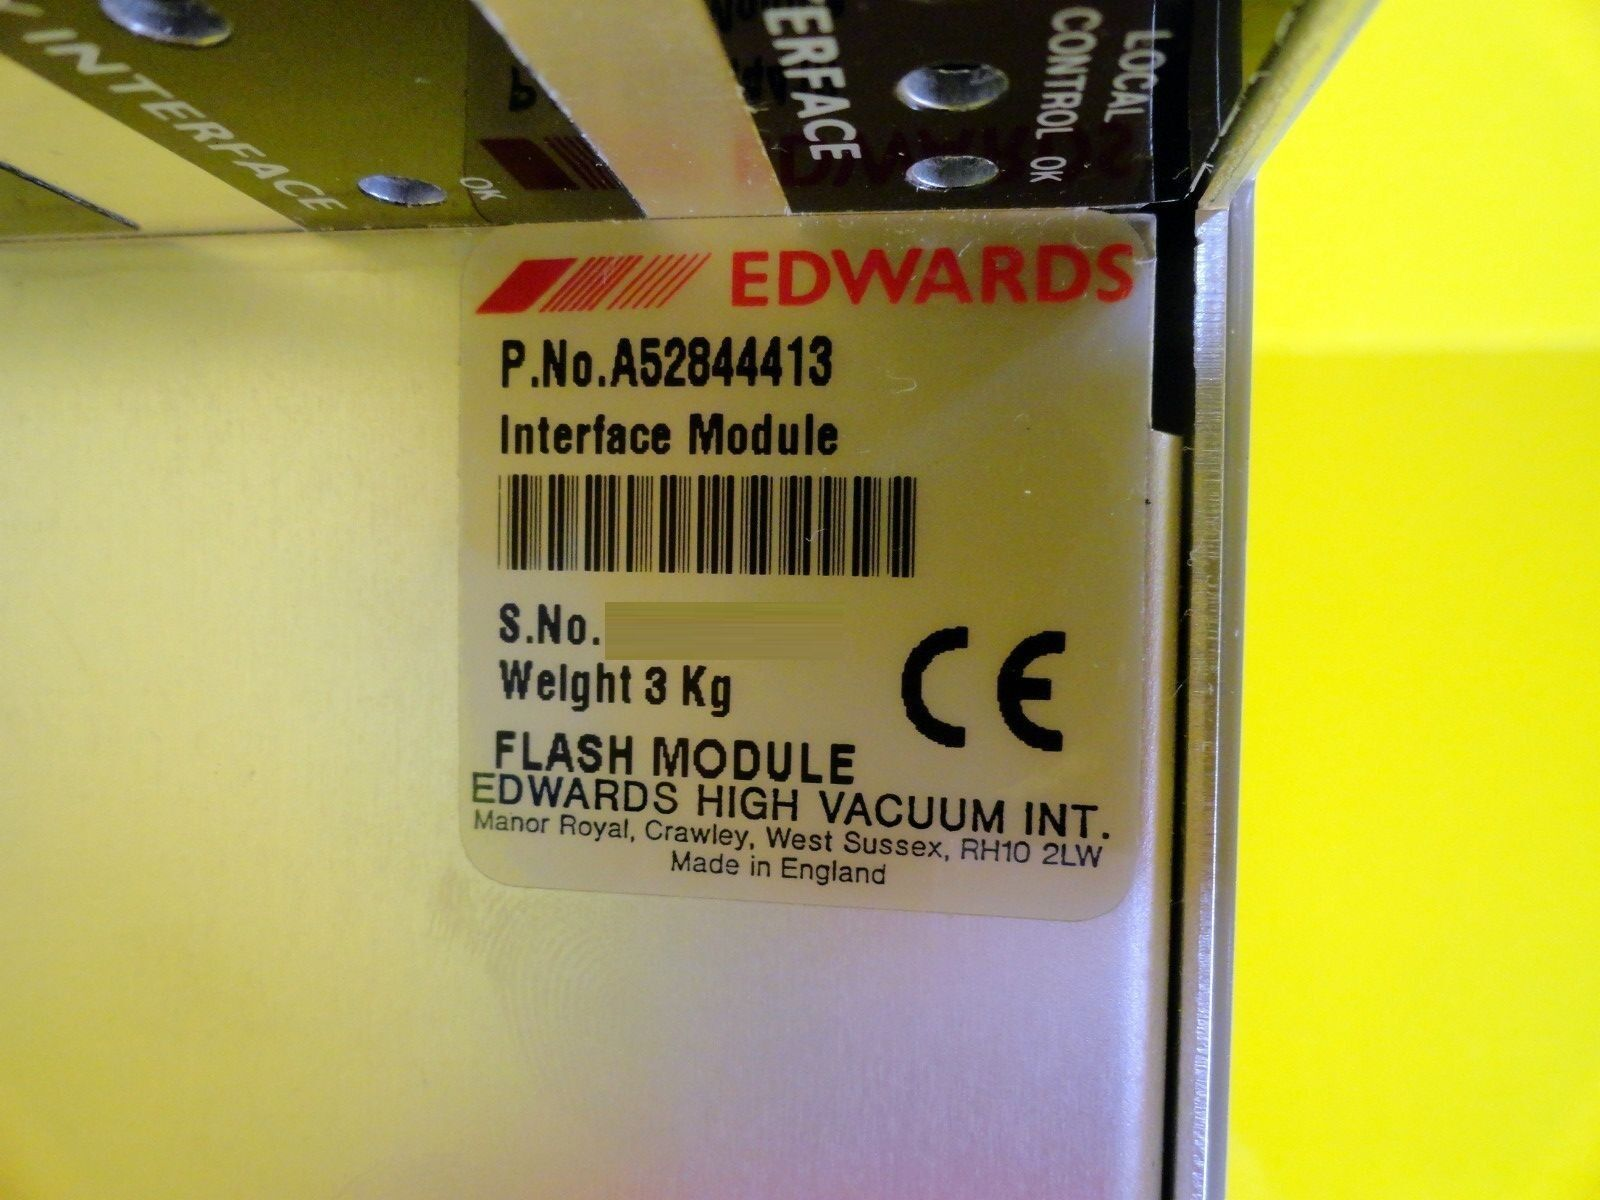 BOC Edwards A52844413 Flash Controller Interface Module